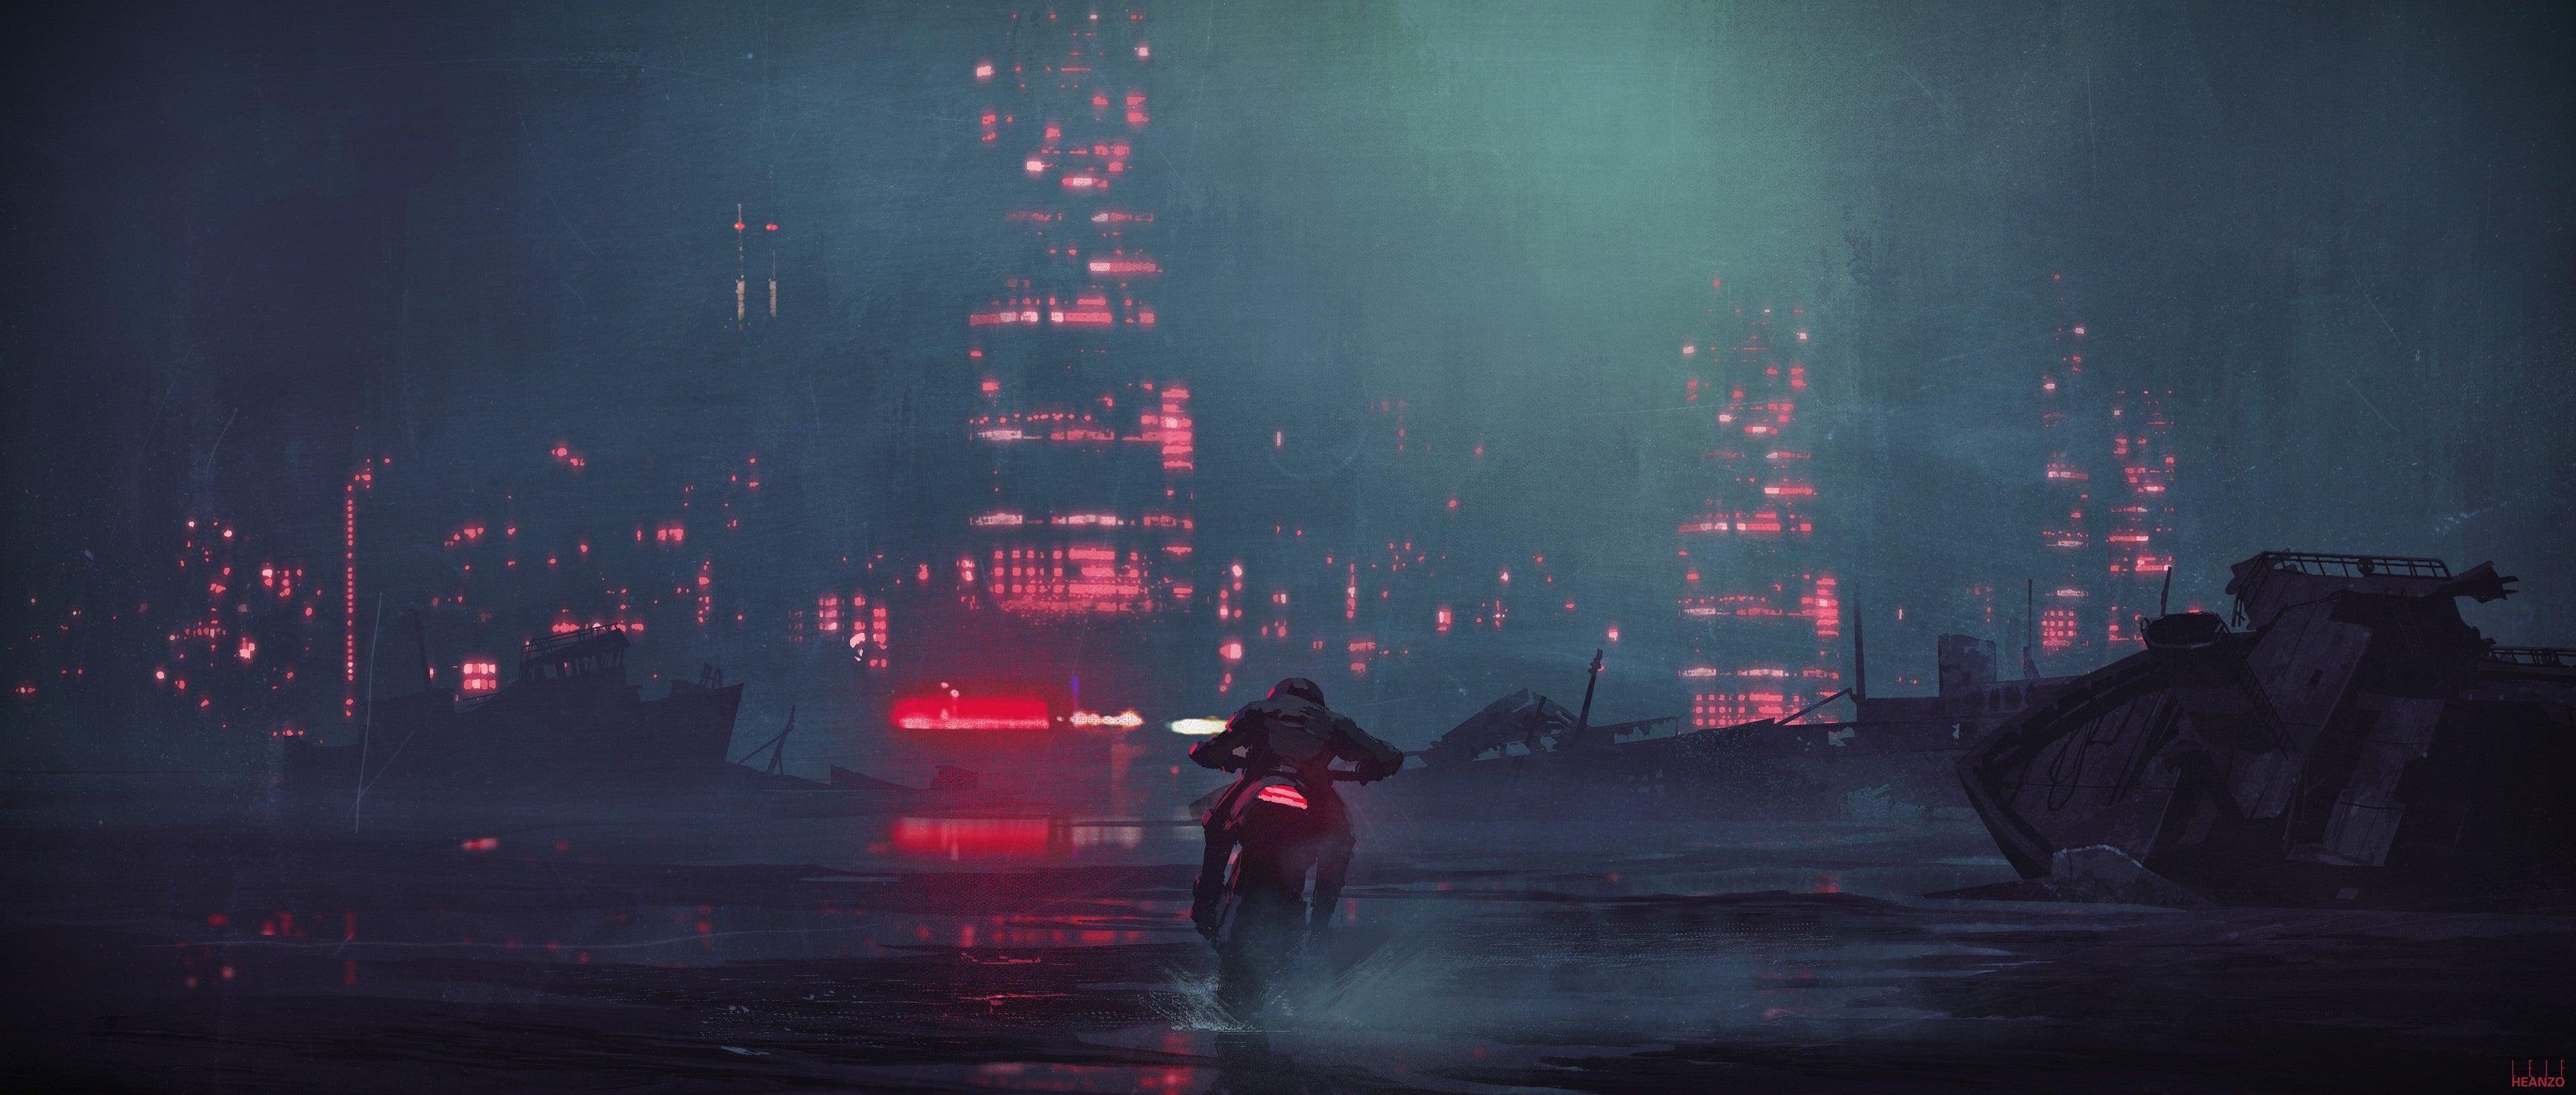 General 3840x1632 artwork digital art cityscape bikes environment ship puddle dark